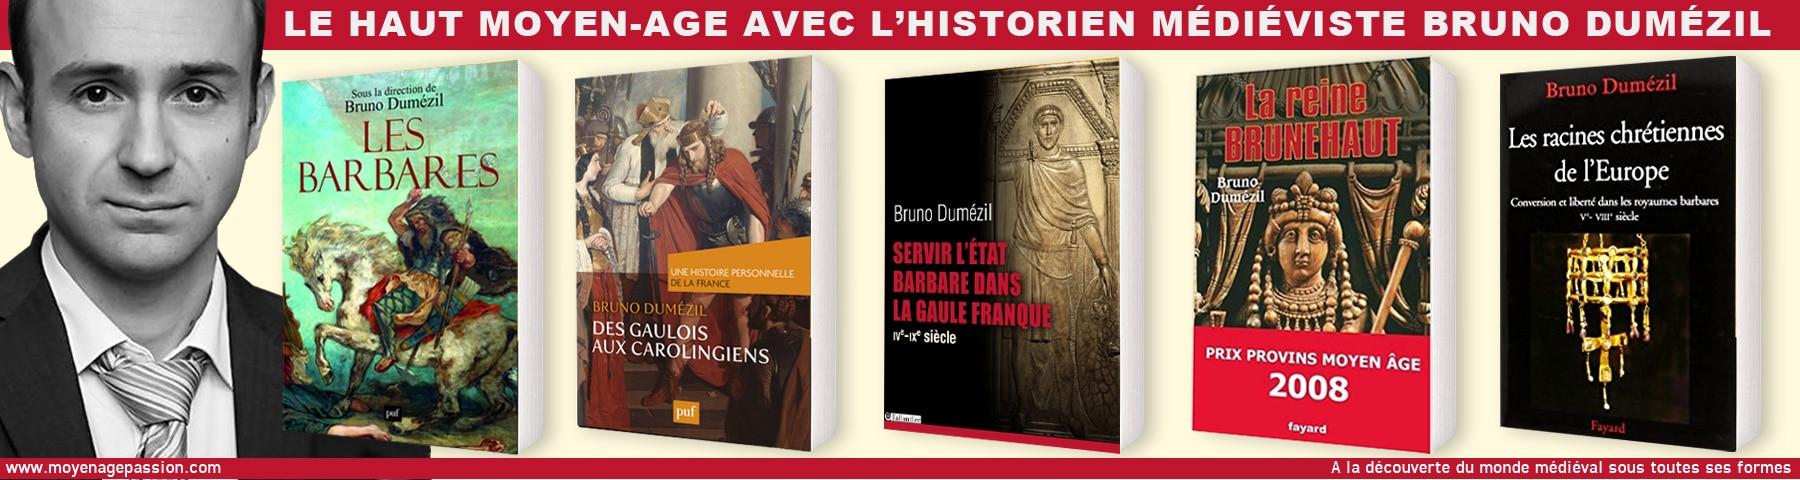 bruno_dumezil_historien_medieviste_livres_ouvrage_monde_medieval_haut_moyen-age_identite_invasion_barbare